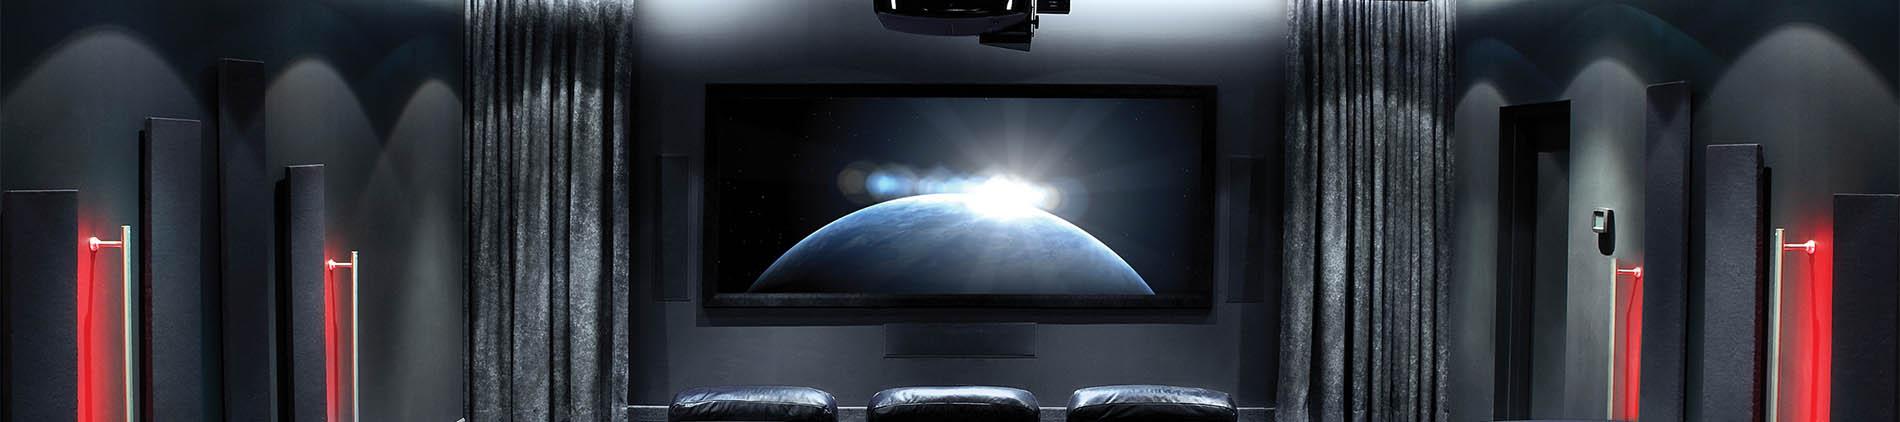 Custom Home, Black, Dark, Projector, Theatre, Screen